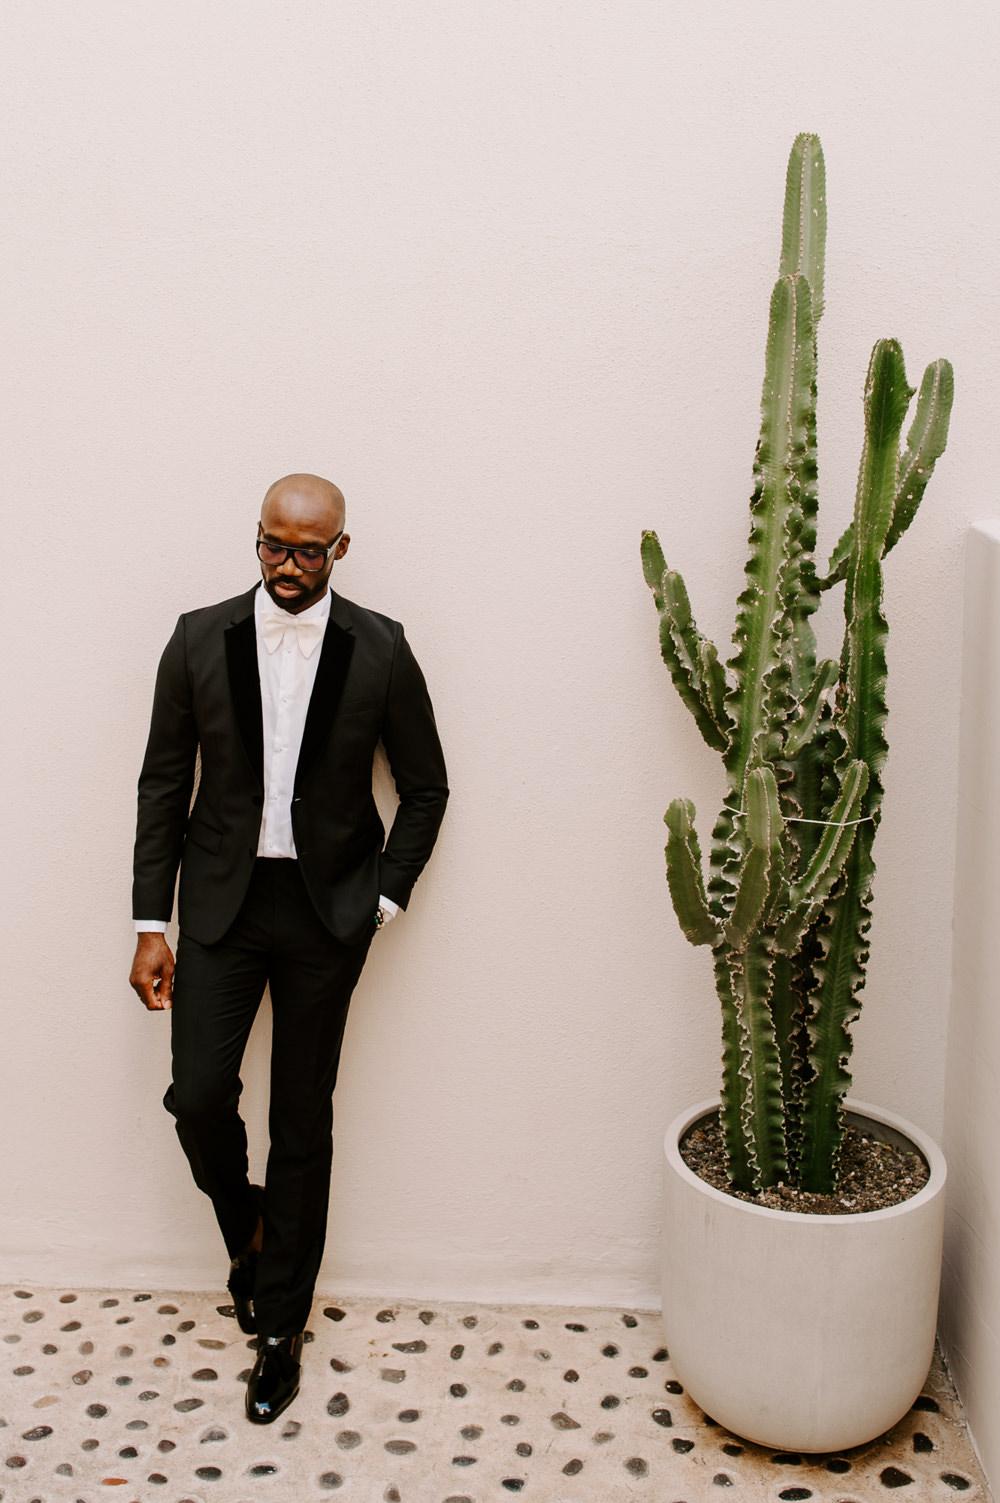 Groom Black Suit Tux Tuxedo Bow Tie Santorini Wedding Phosart Photography